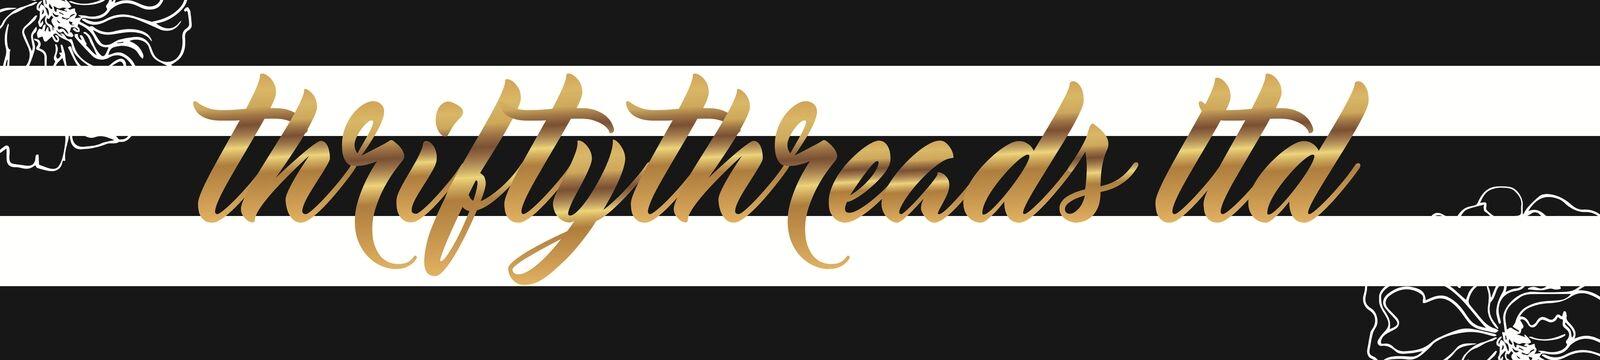 thriftythreads ltd